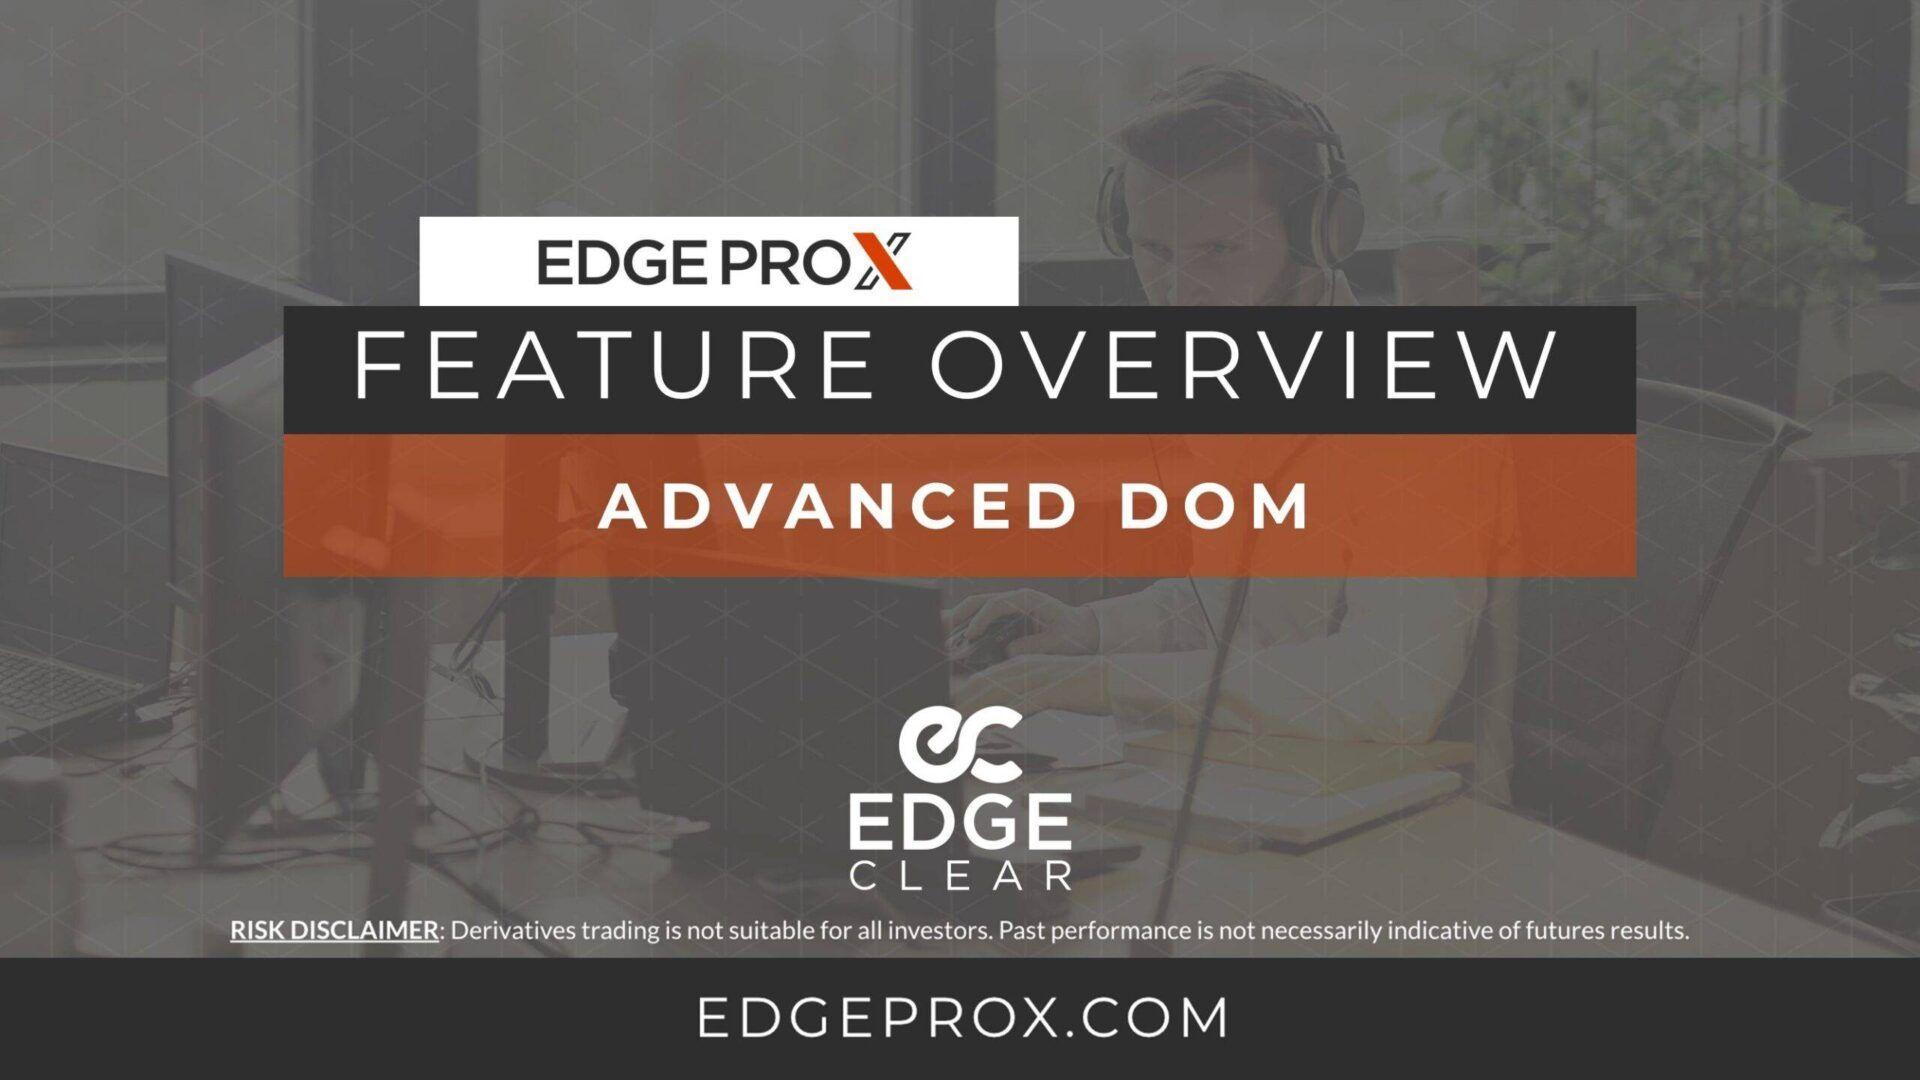 EdgeProX Advanced DOM